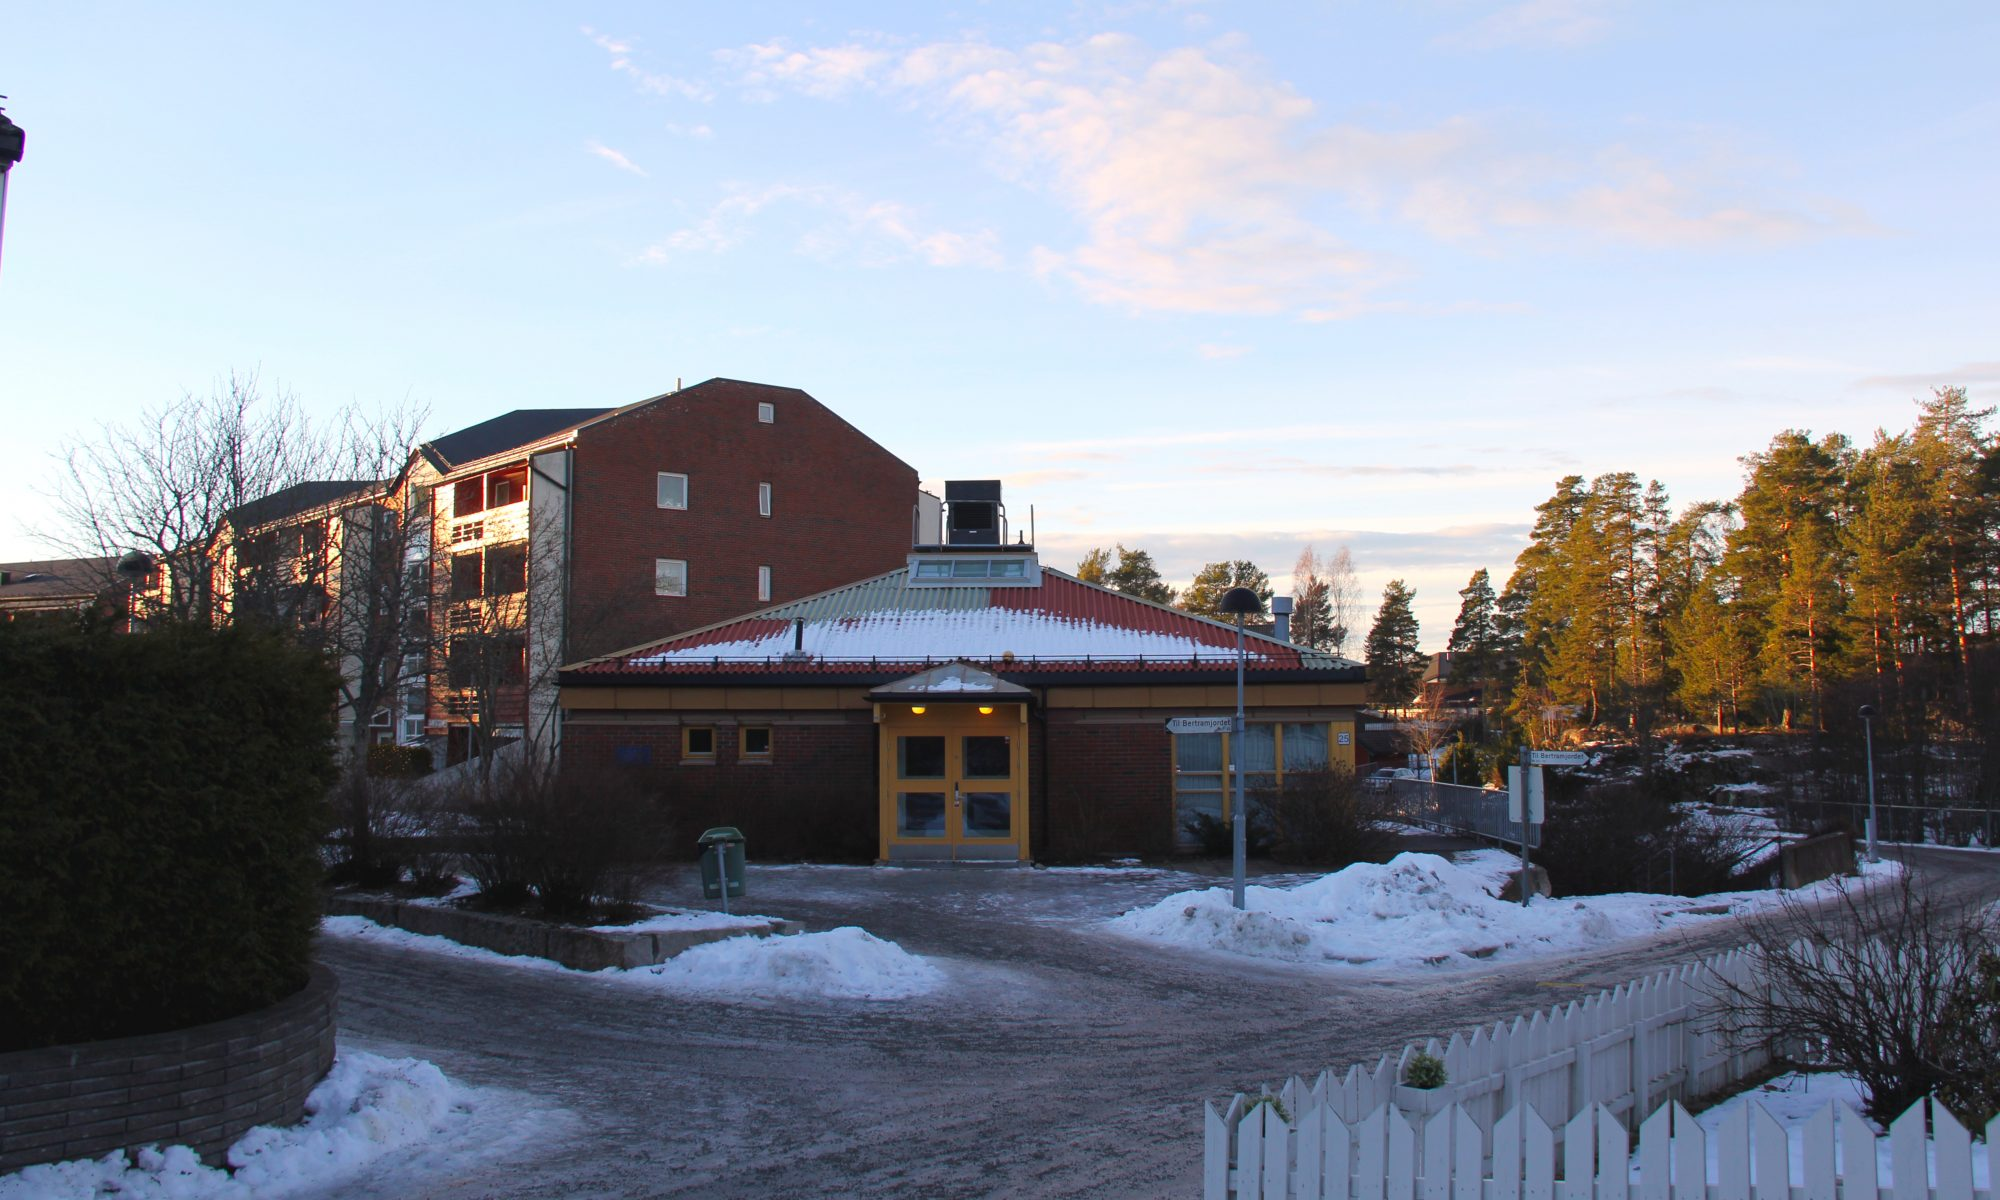 Grendehuset B25